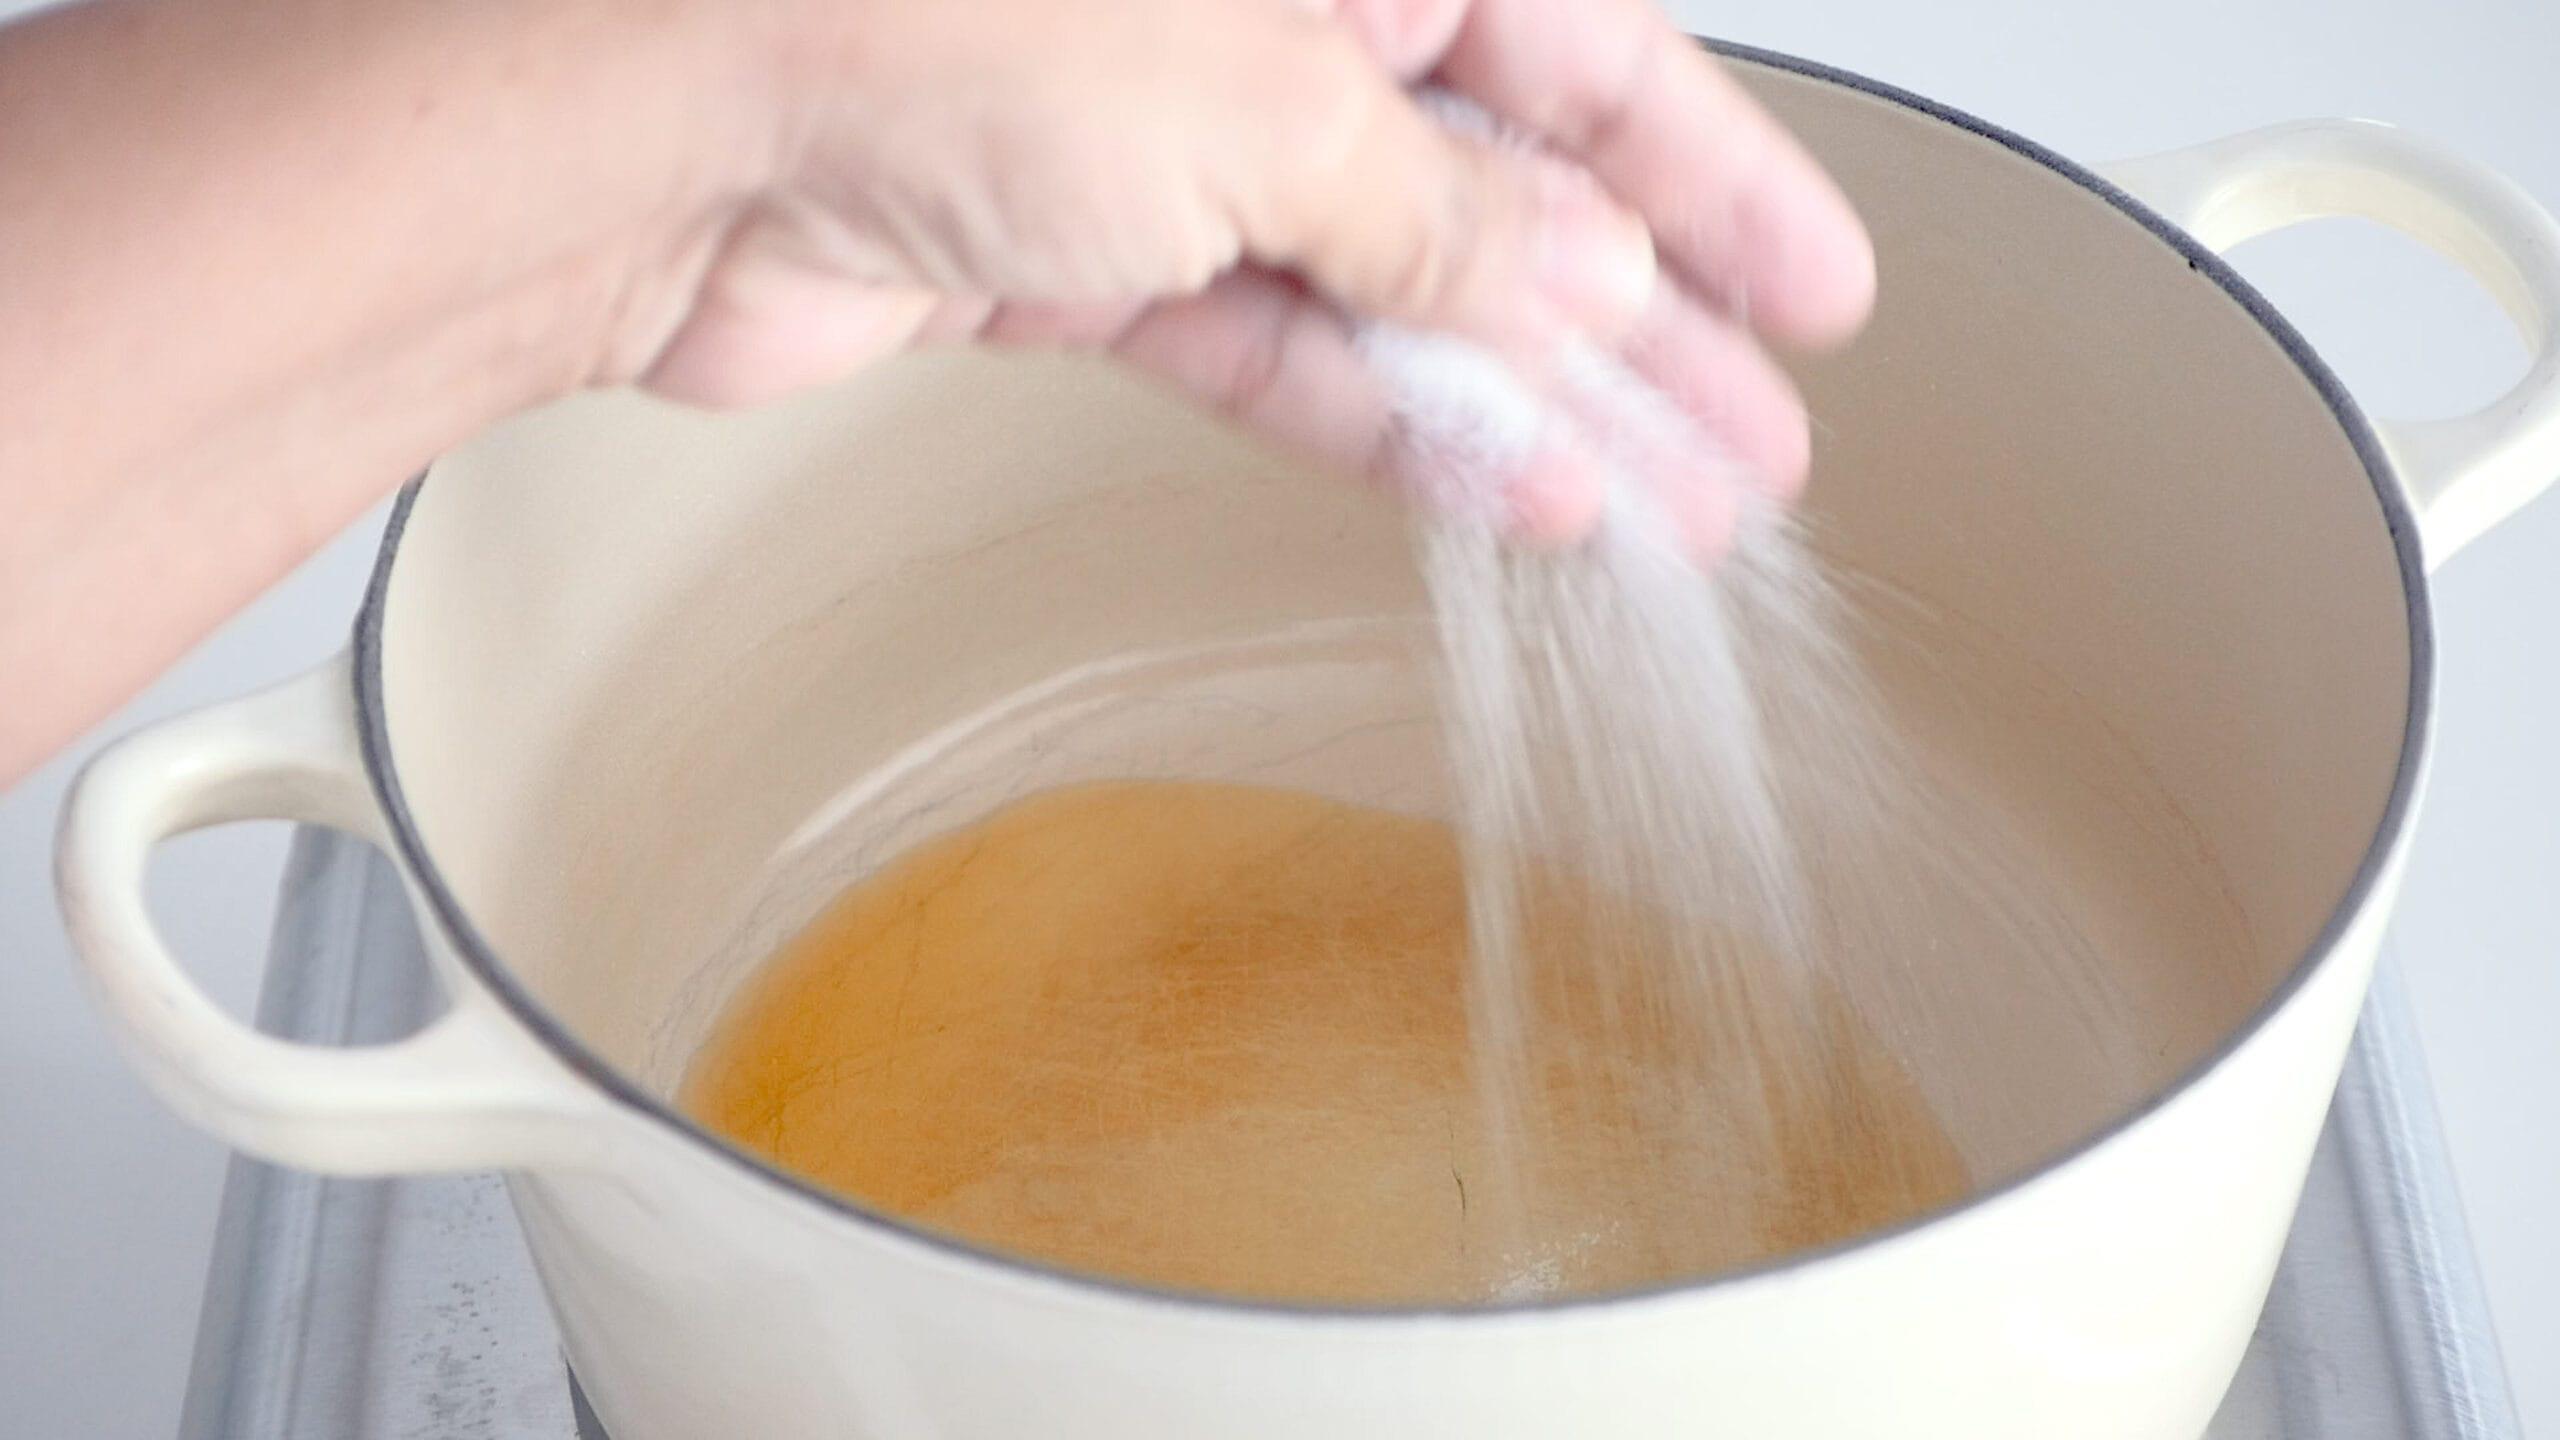 Adding salt to the oil